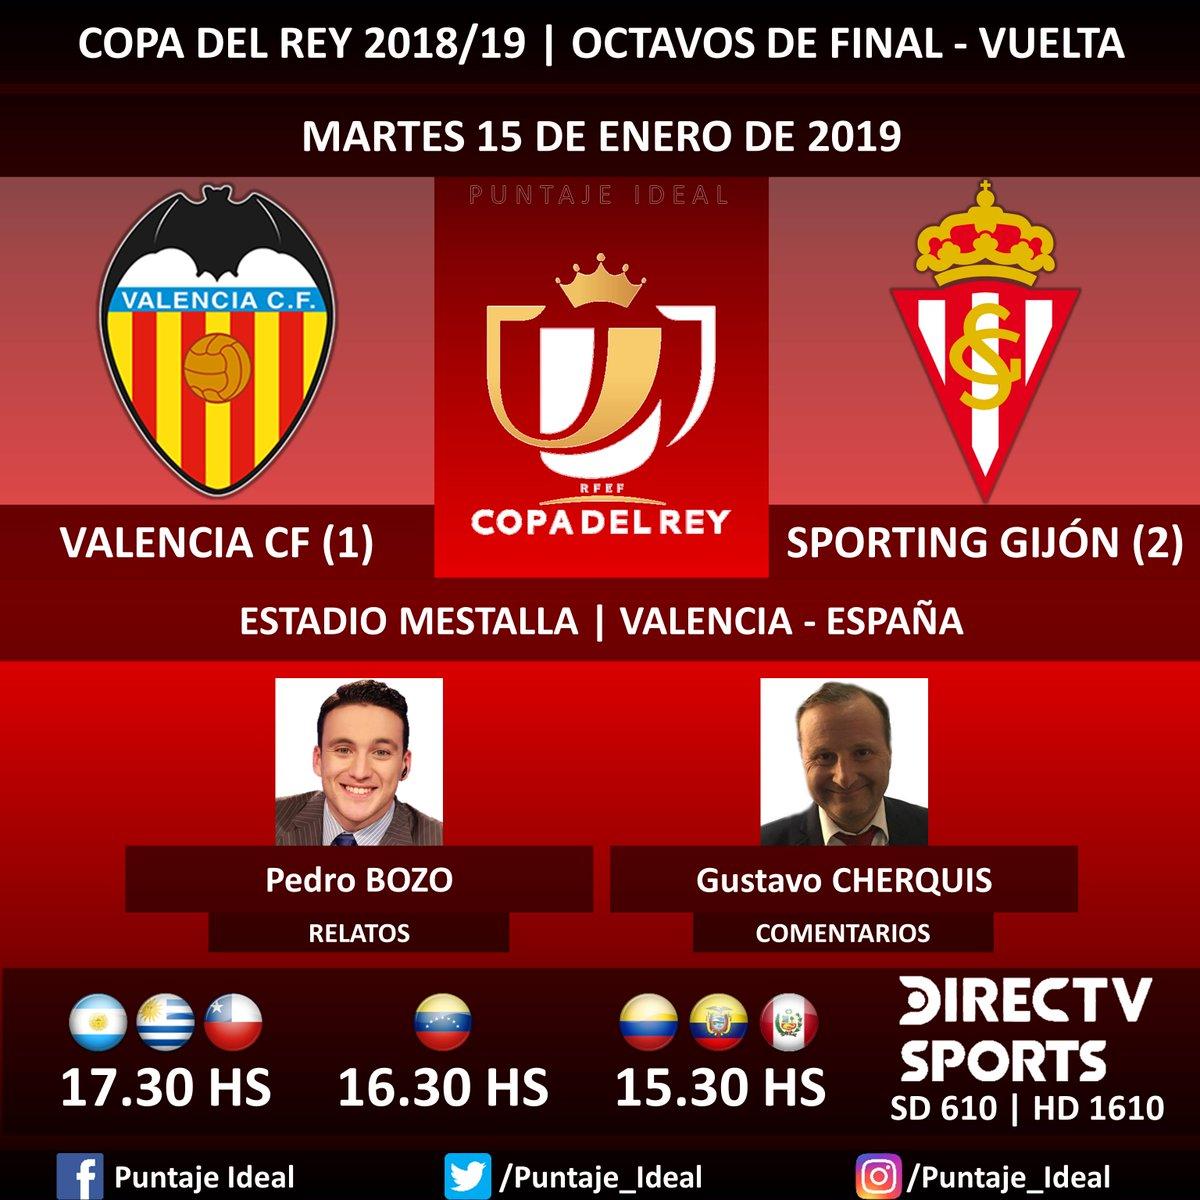 ⚽ #FútbolEnDIRECTV   #ValenciaCF vs. #SportingGijón 🎙 Relatos: @pedrobozoa  🎙 Comentarios: @Gustavo_che  📺 TV: @DIRECTVSports Sudamérica (610 - 1610 HD) - #Torneos 🤳 #SoySportista - #CopaDelRey 🇪🇸 - #ValenciaSporting  Dale RT 🔃